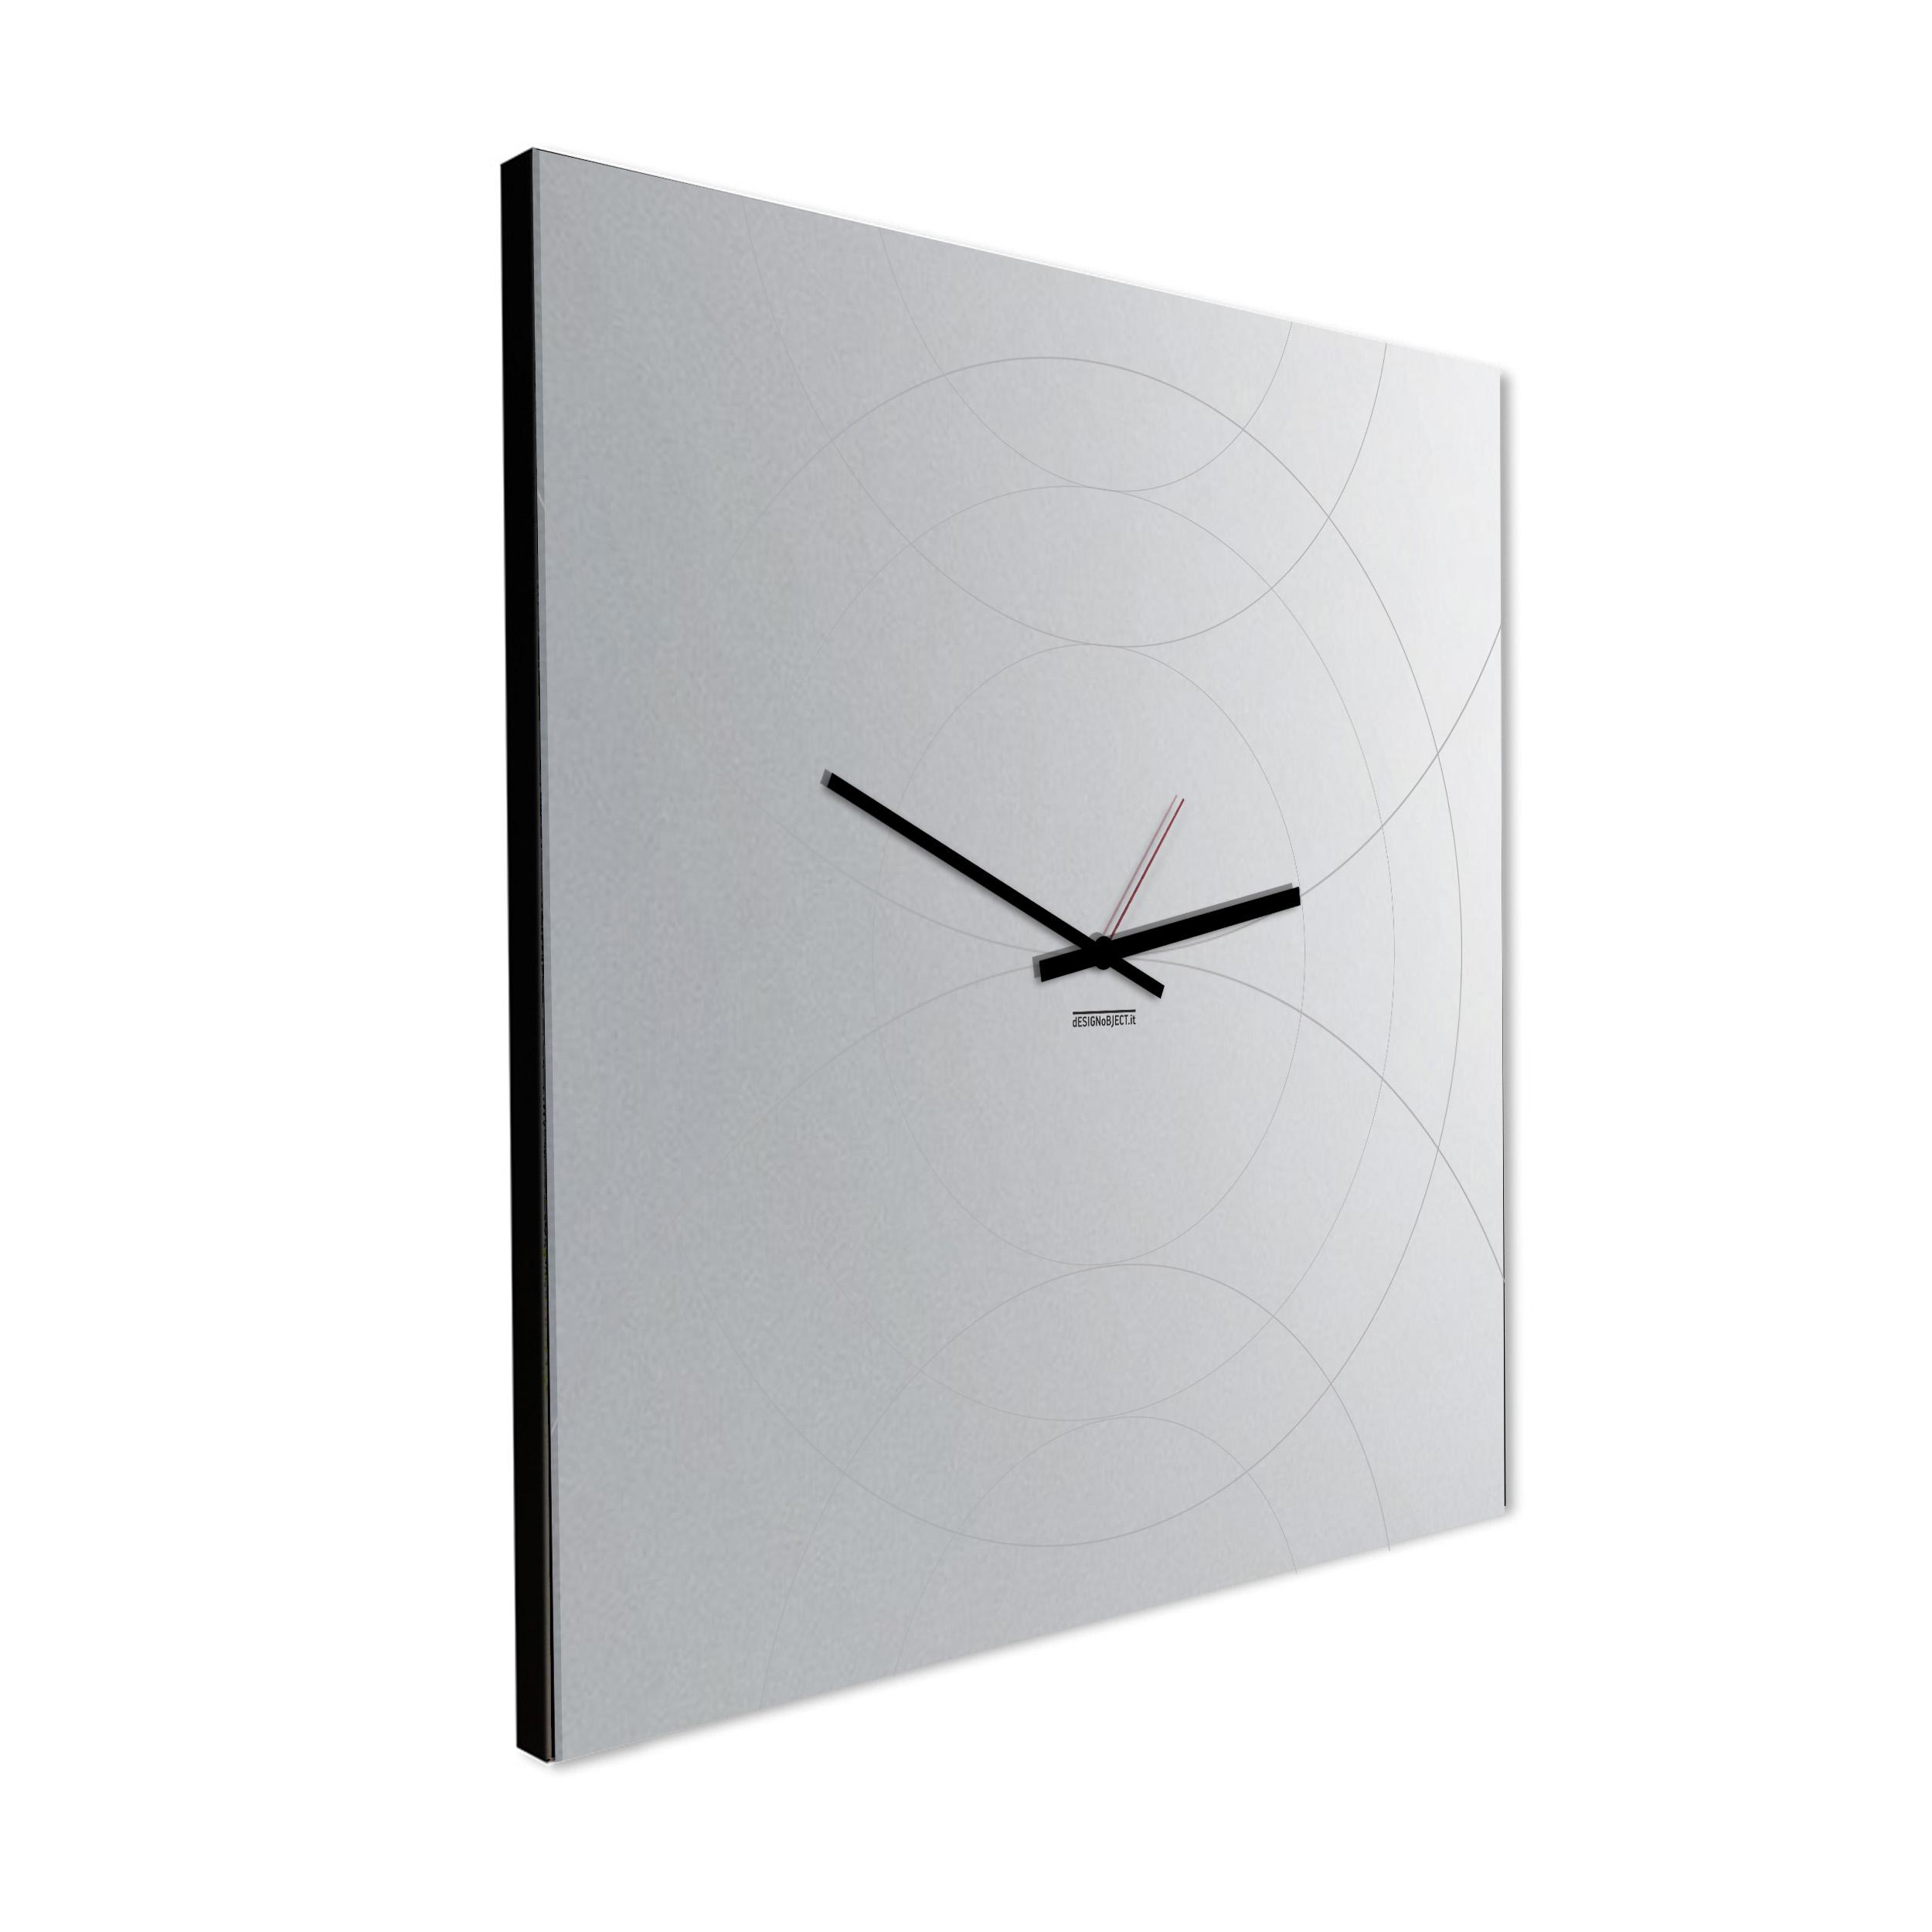 [:it]Orologio Specchio Narciso[:en]Clock Mirror Narciso[:]